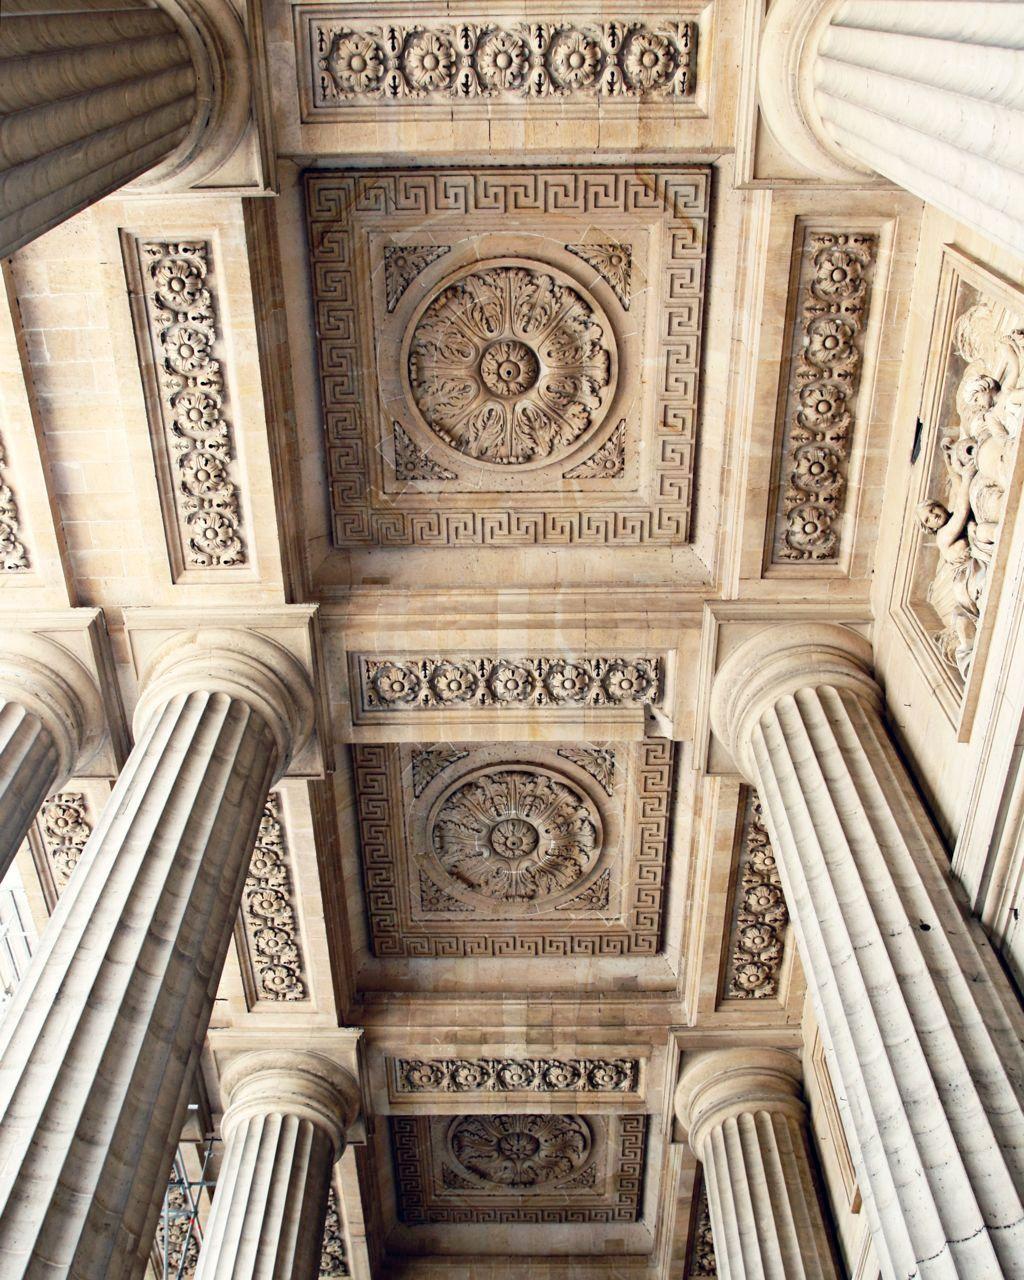 Paris Architecture Photography Print - Columns of Saint Sulpice Photo - Parisian Wall Art - France Travel Picture - Neutral French Decor